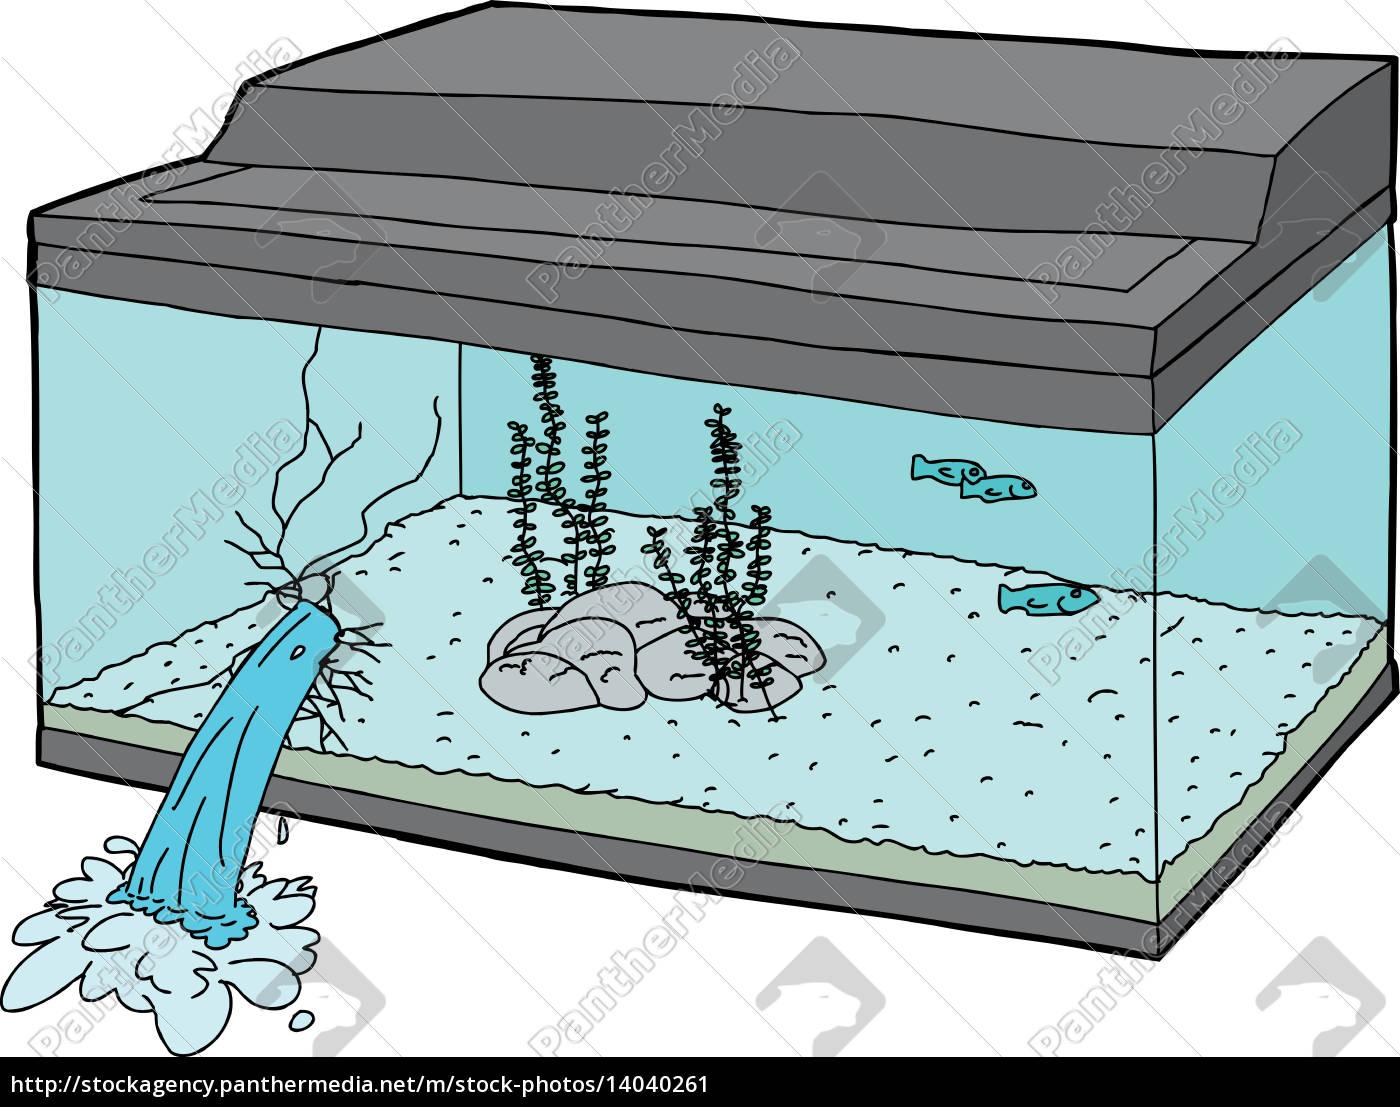 broken, fish, tank, with, fish, swimming - 14040261